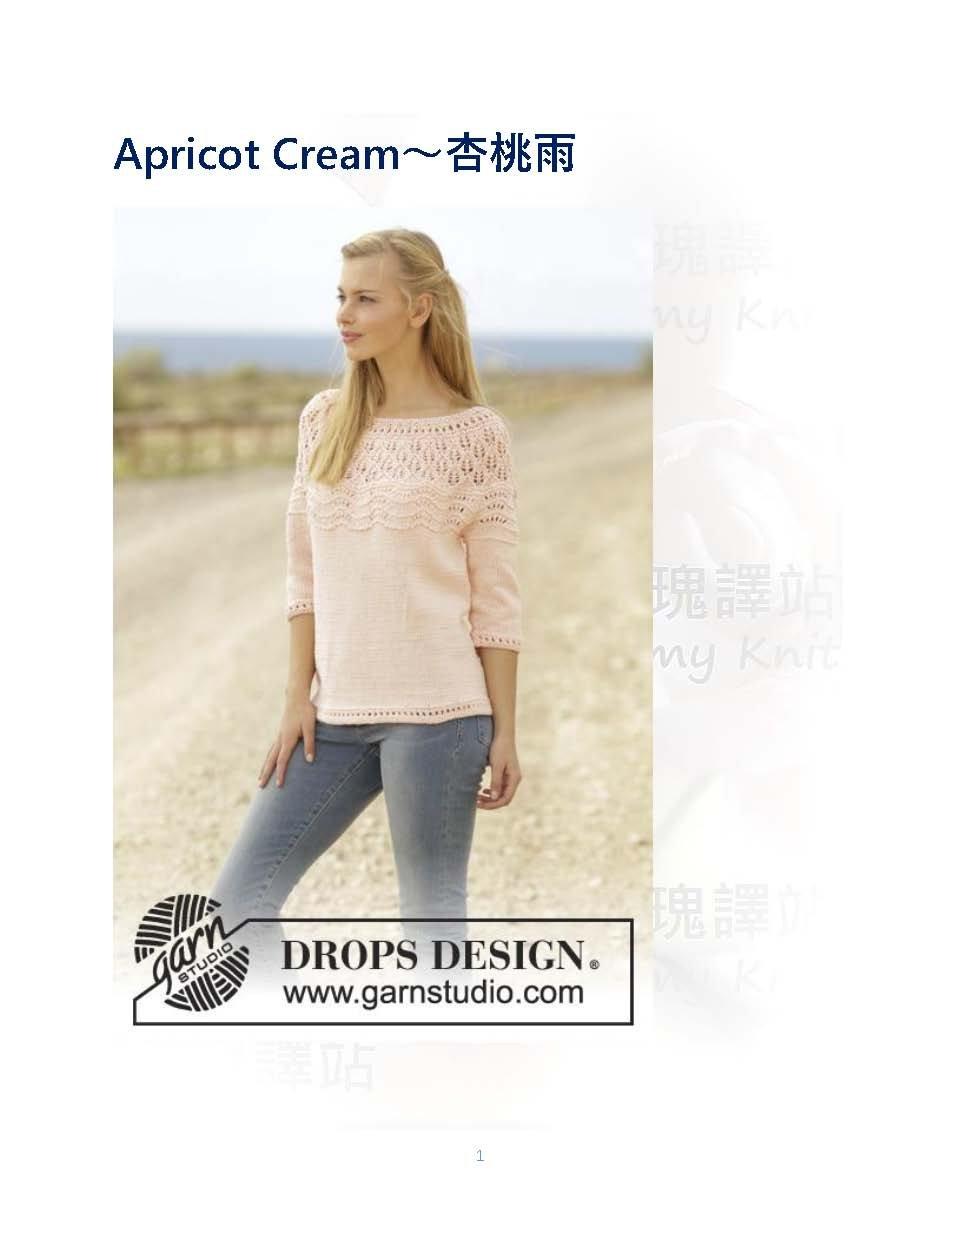 Apricot Cream_Page_1.jpg